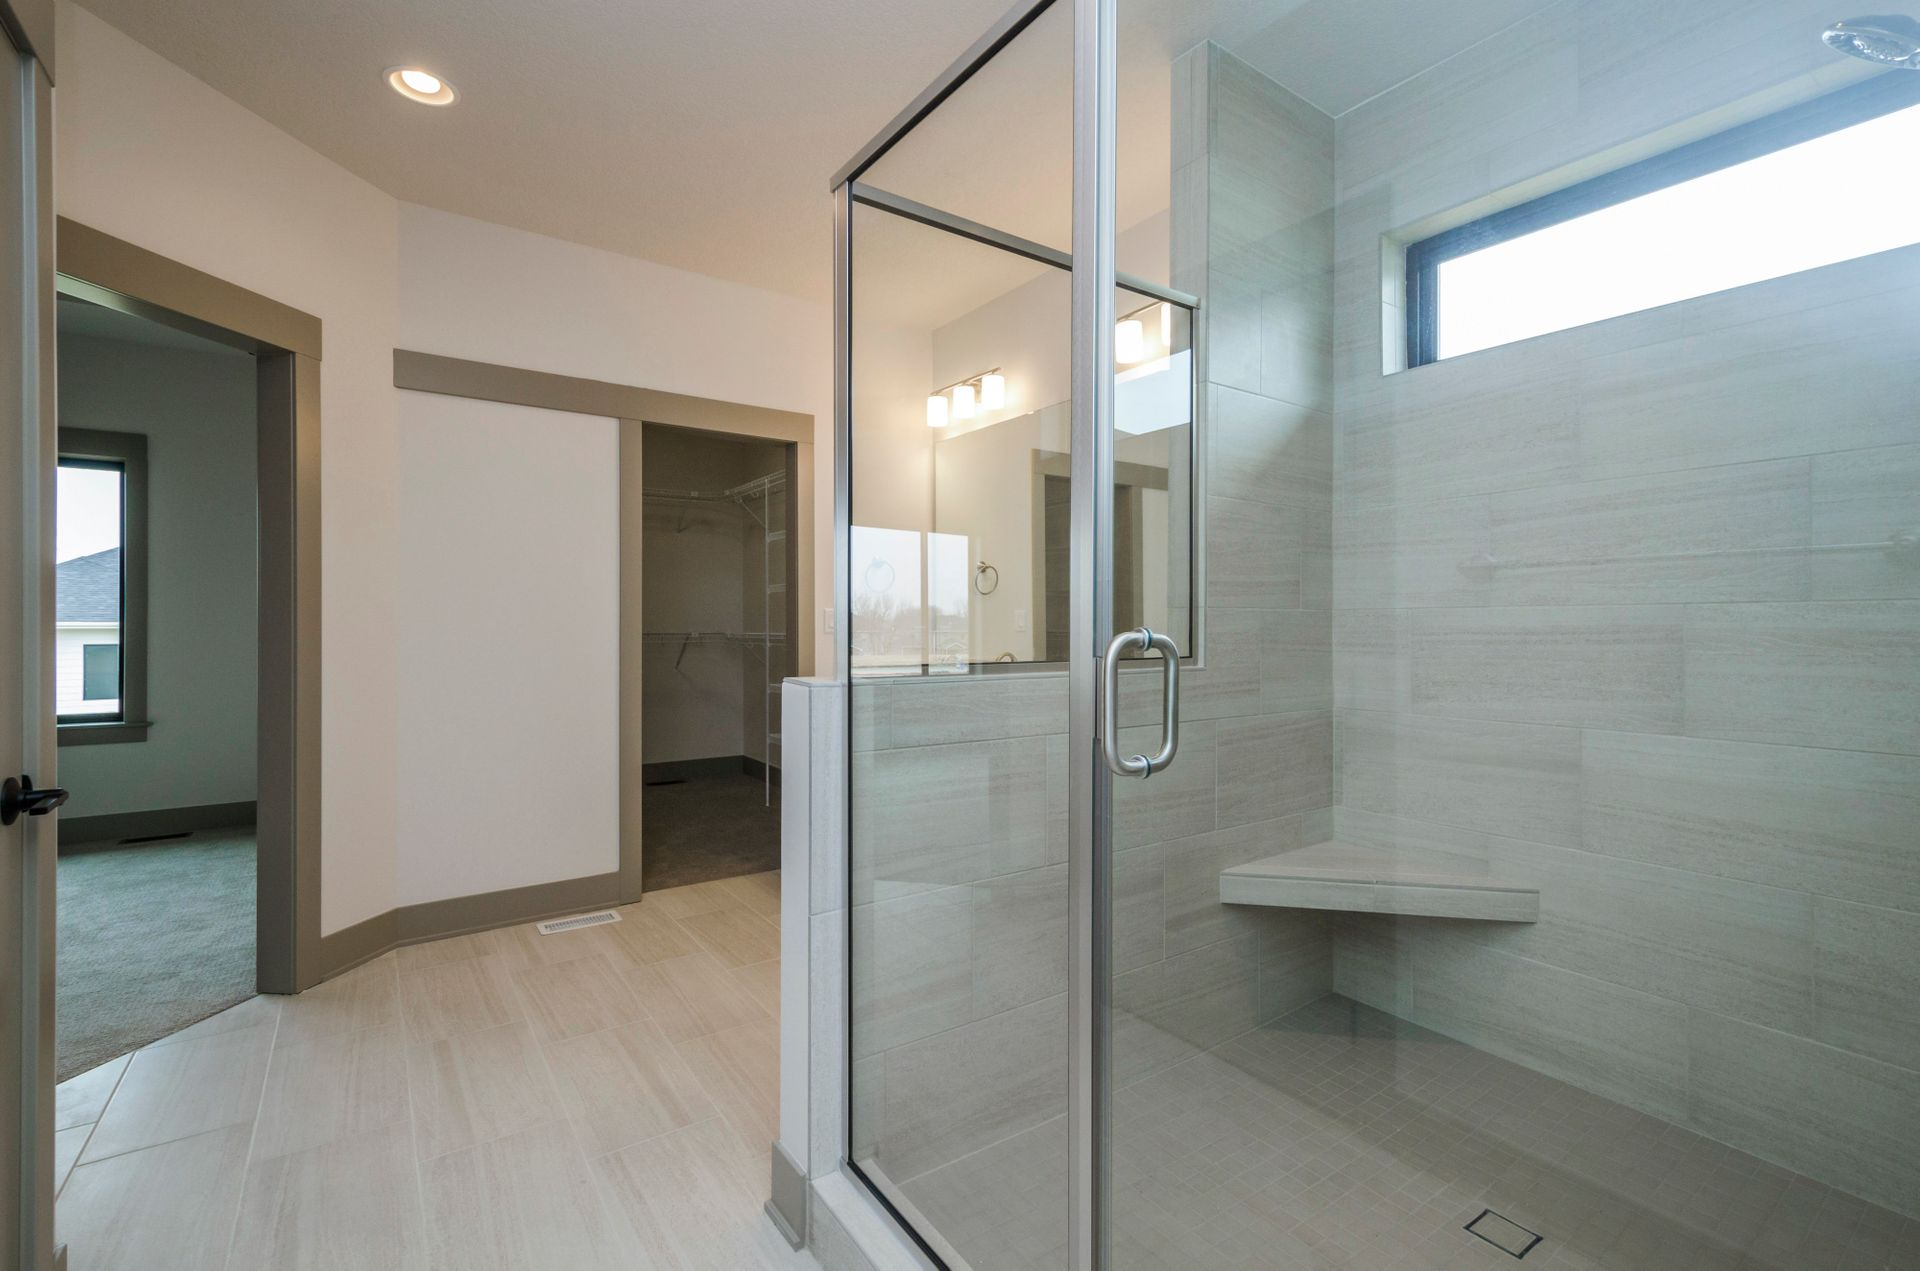 Next-Step-Homes_16885-madison-cir-clive-IA13.jpg